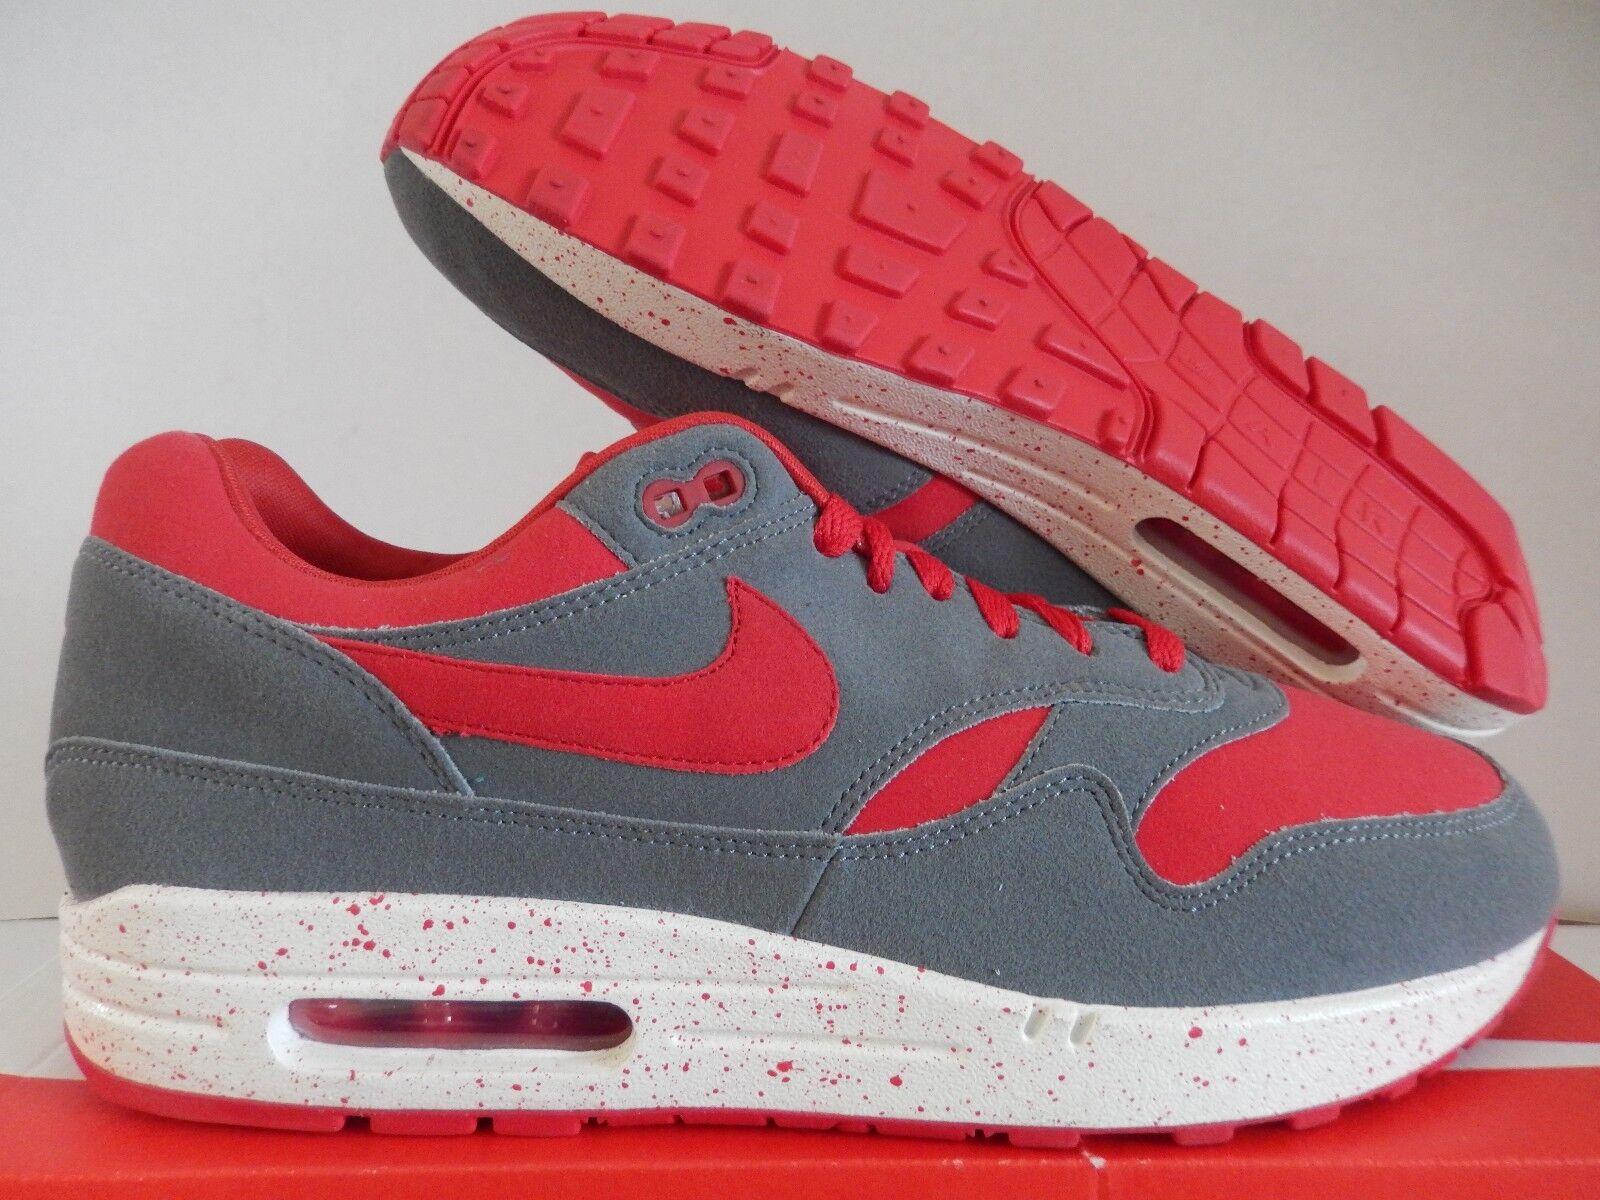 Nike id air max 1 id Nike cool Grau-ROT-Weiß sz 11 [943756-971] b06014